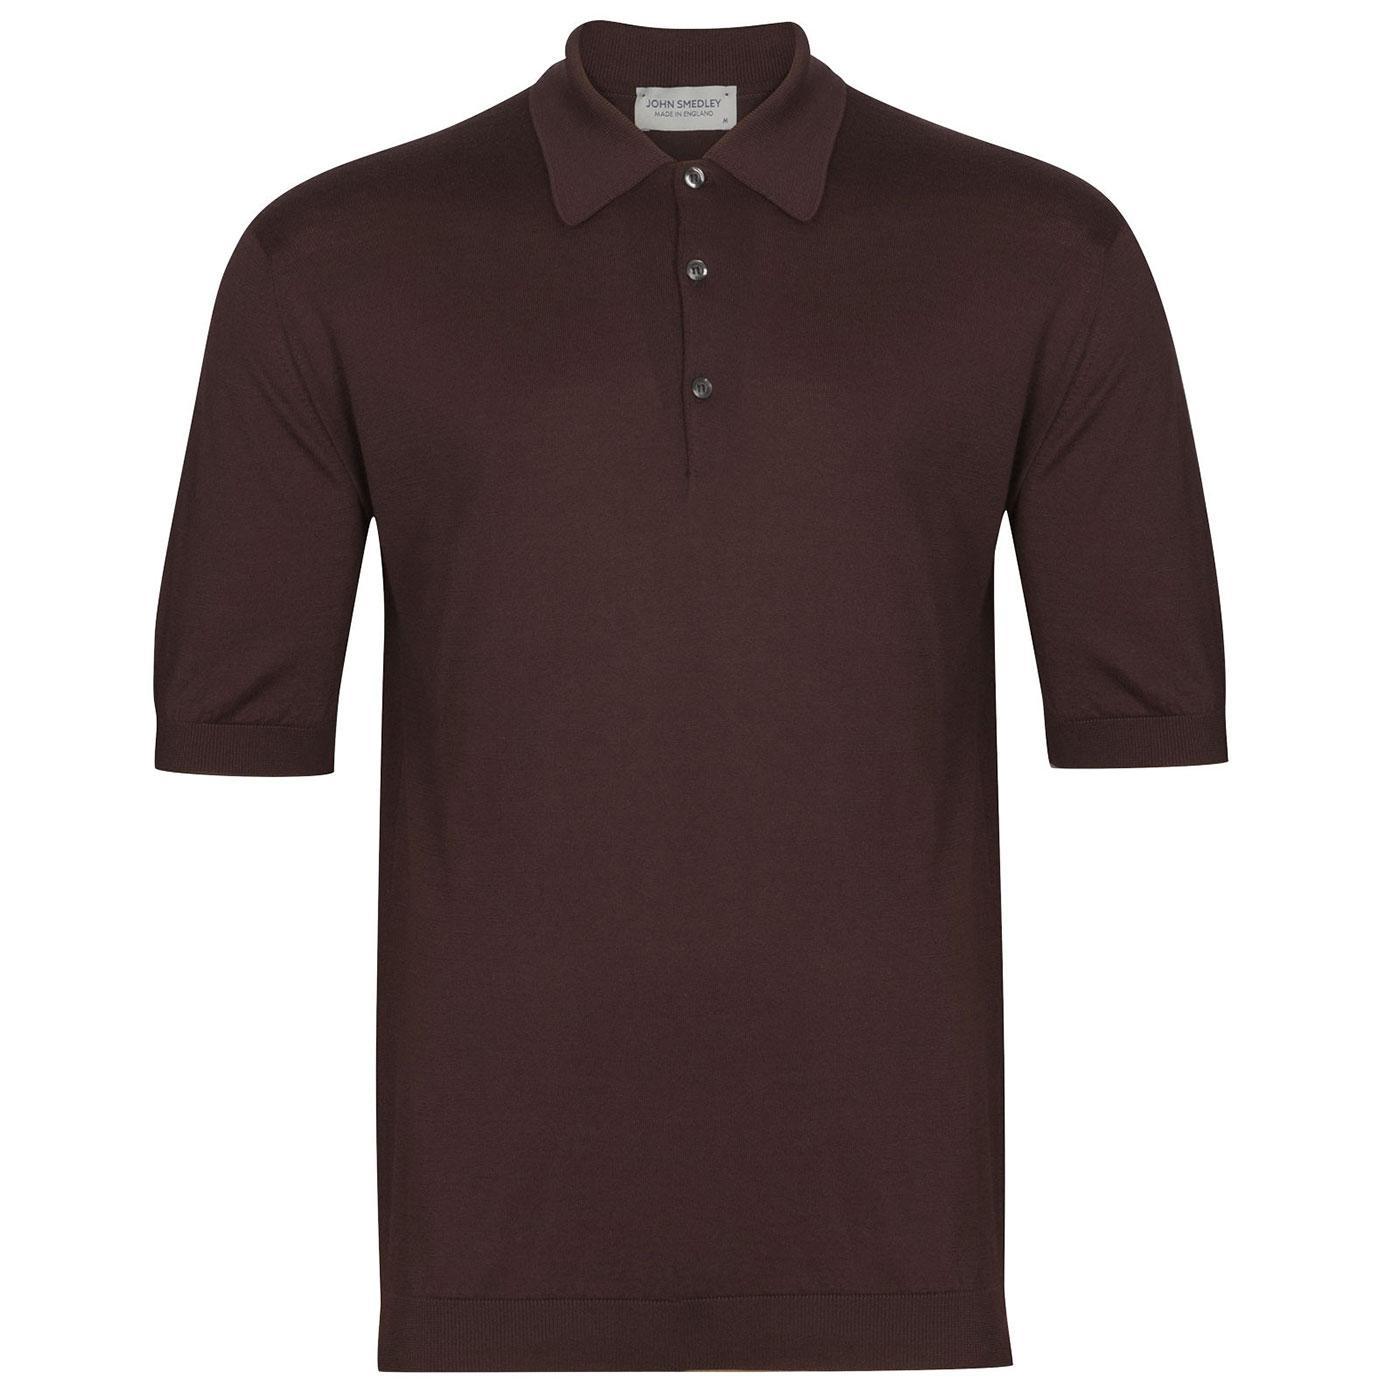 Isis JOHN SMEDLEY Men's Mod Knitted Polo Shirt CB